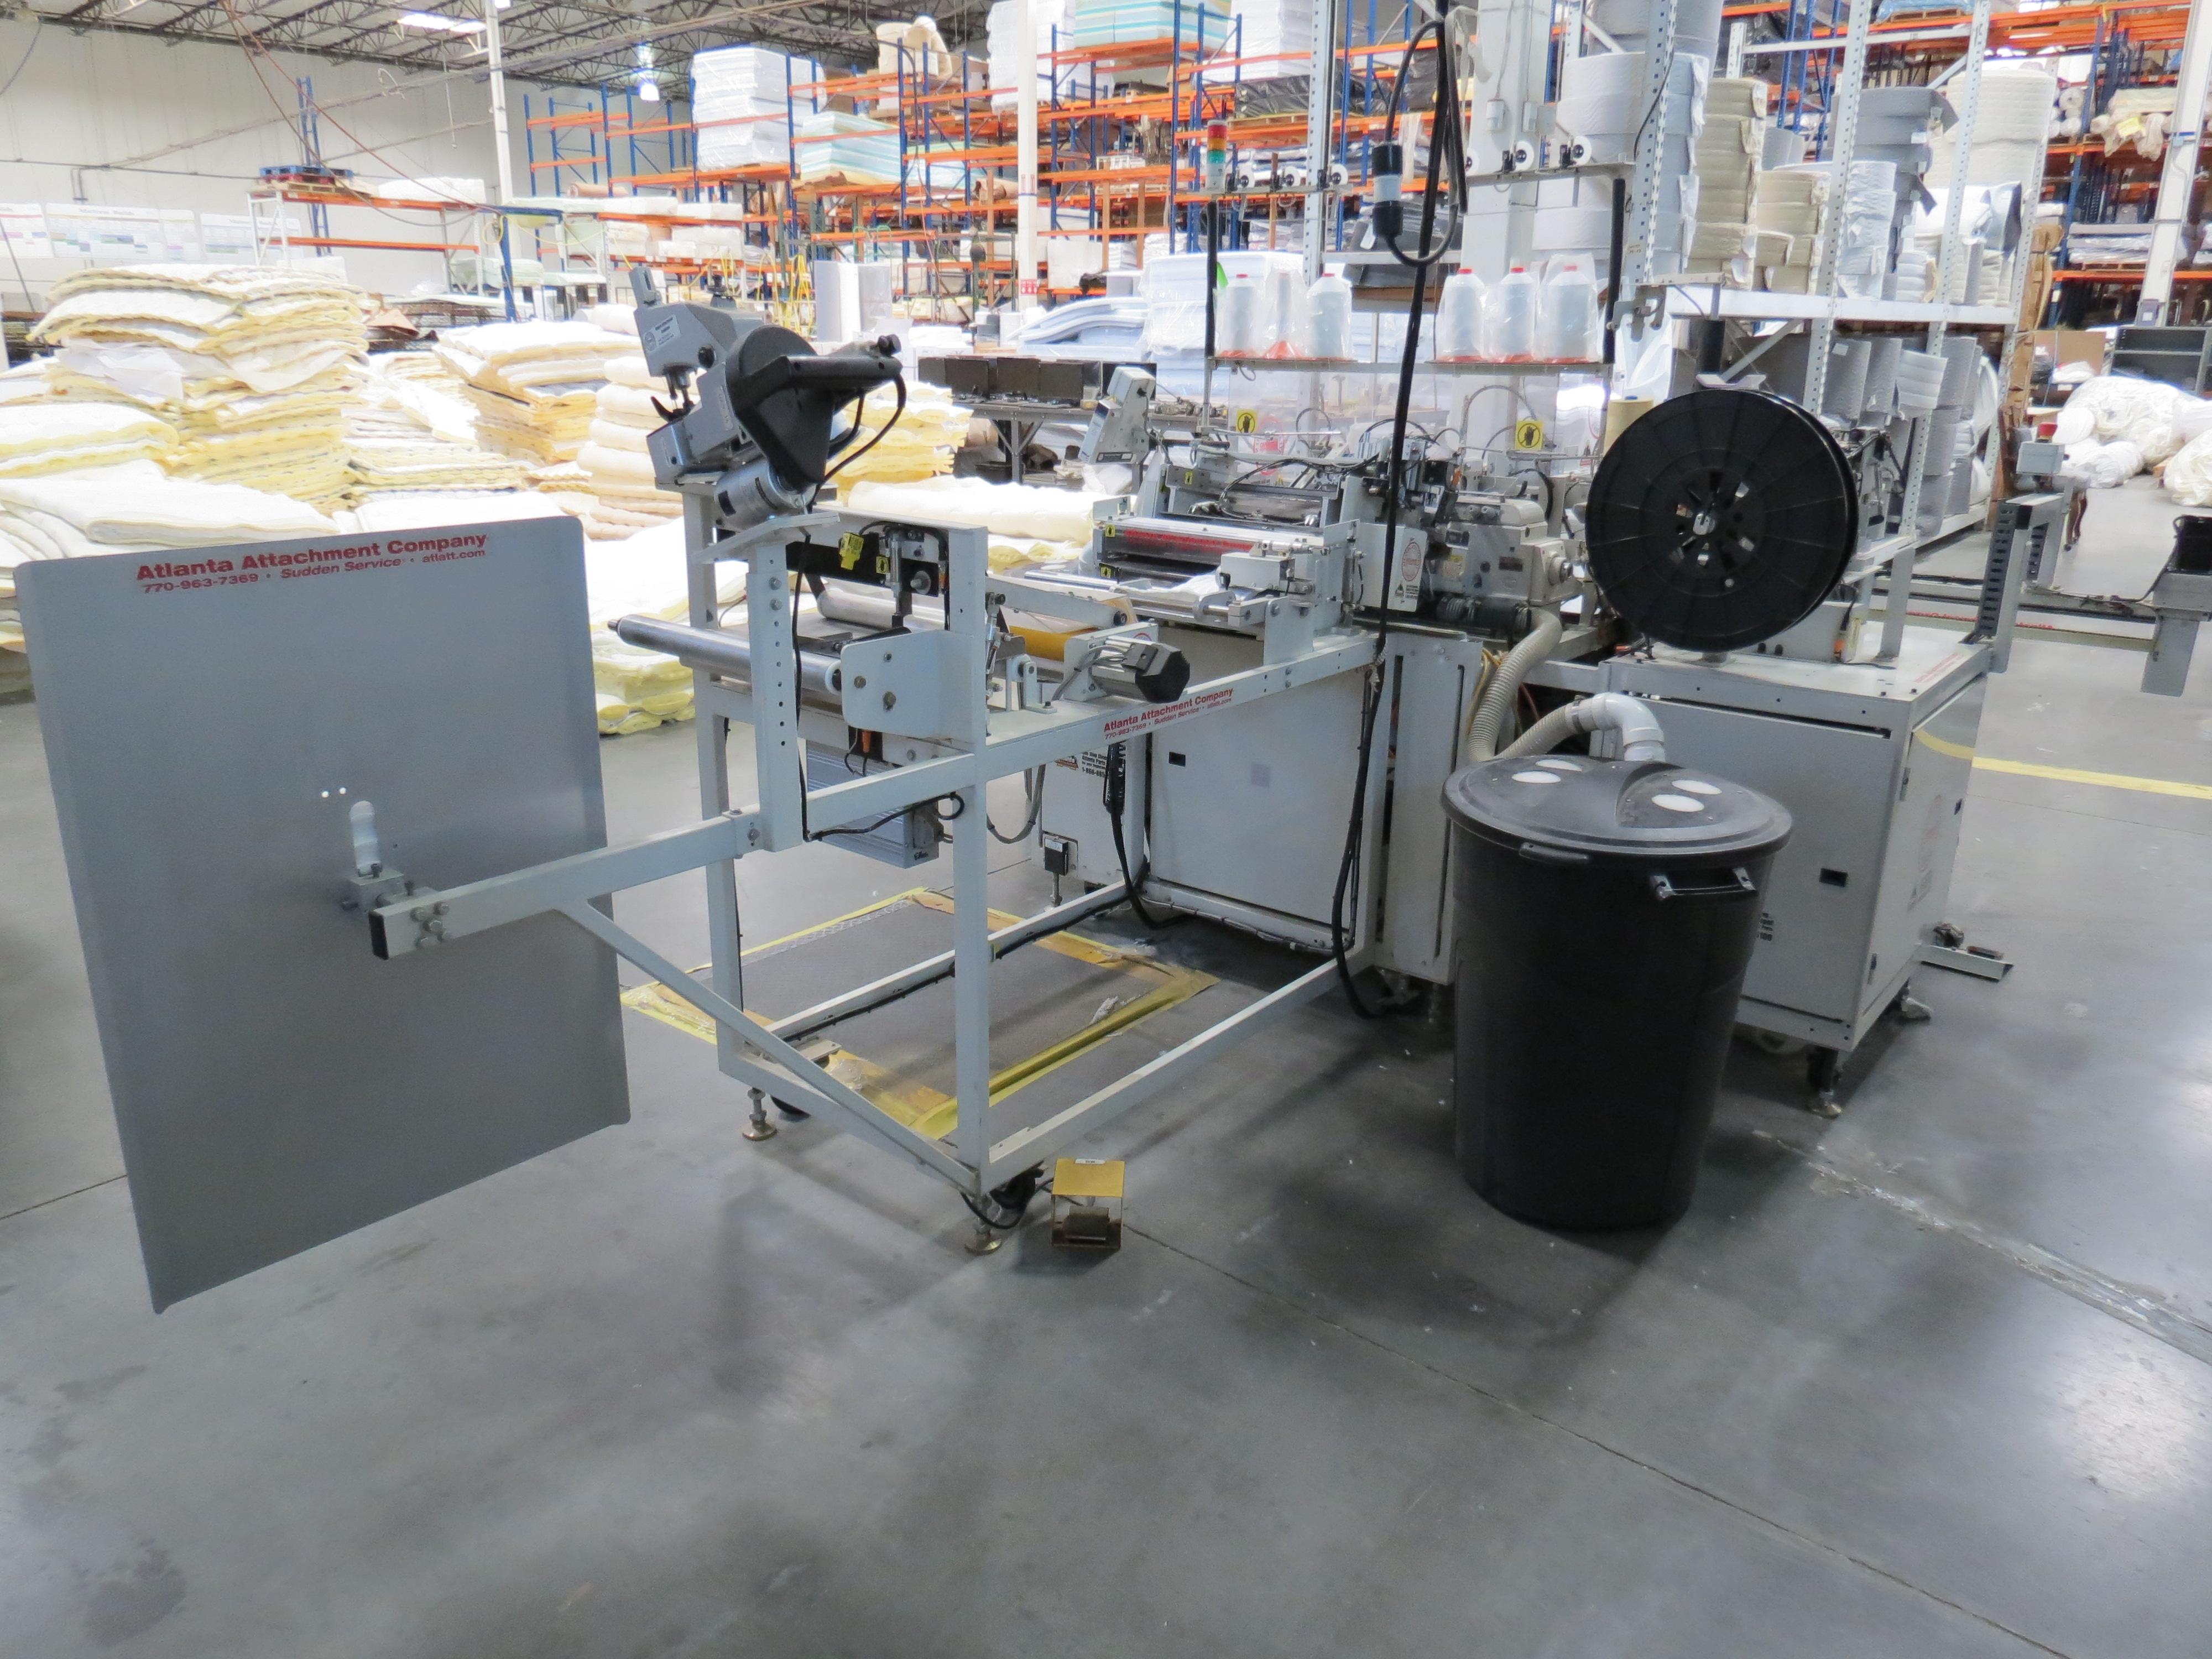 Atlanta Attachment Company, 4300BBorder/Attach Handles Sewing Machine, 220V, SN:209227071609, Juki - Image 4 of 11